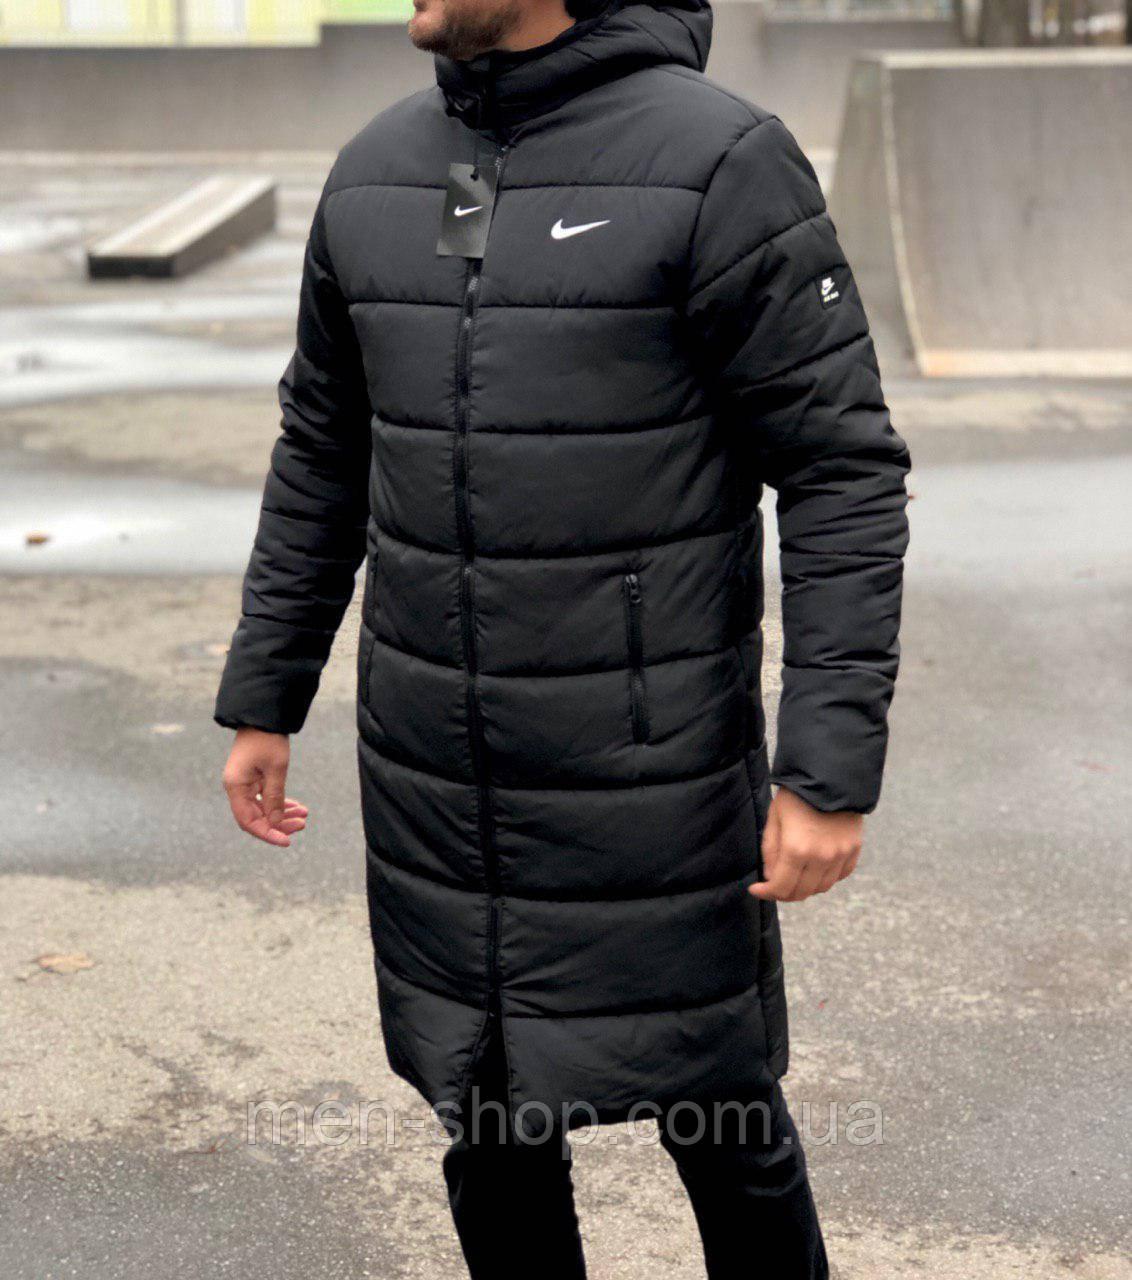 Куртка мужская зимняя в стиле Nike